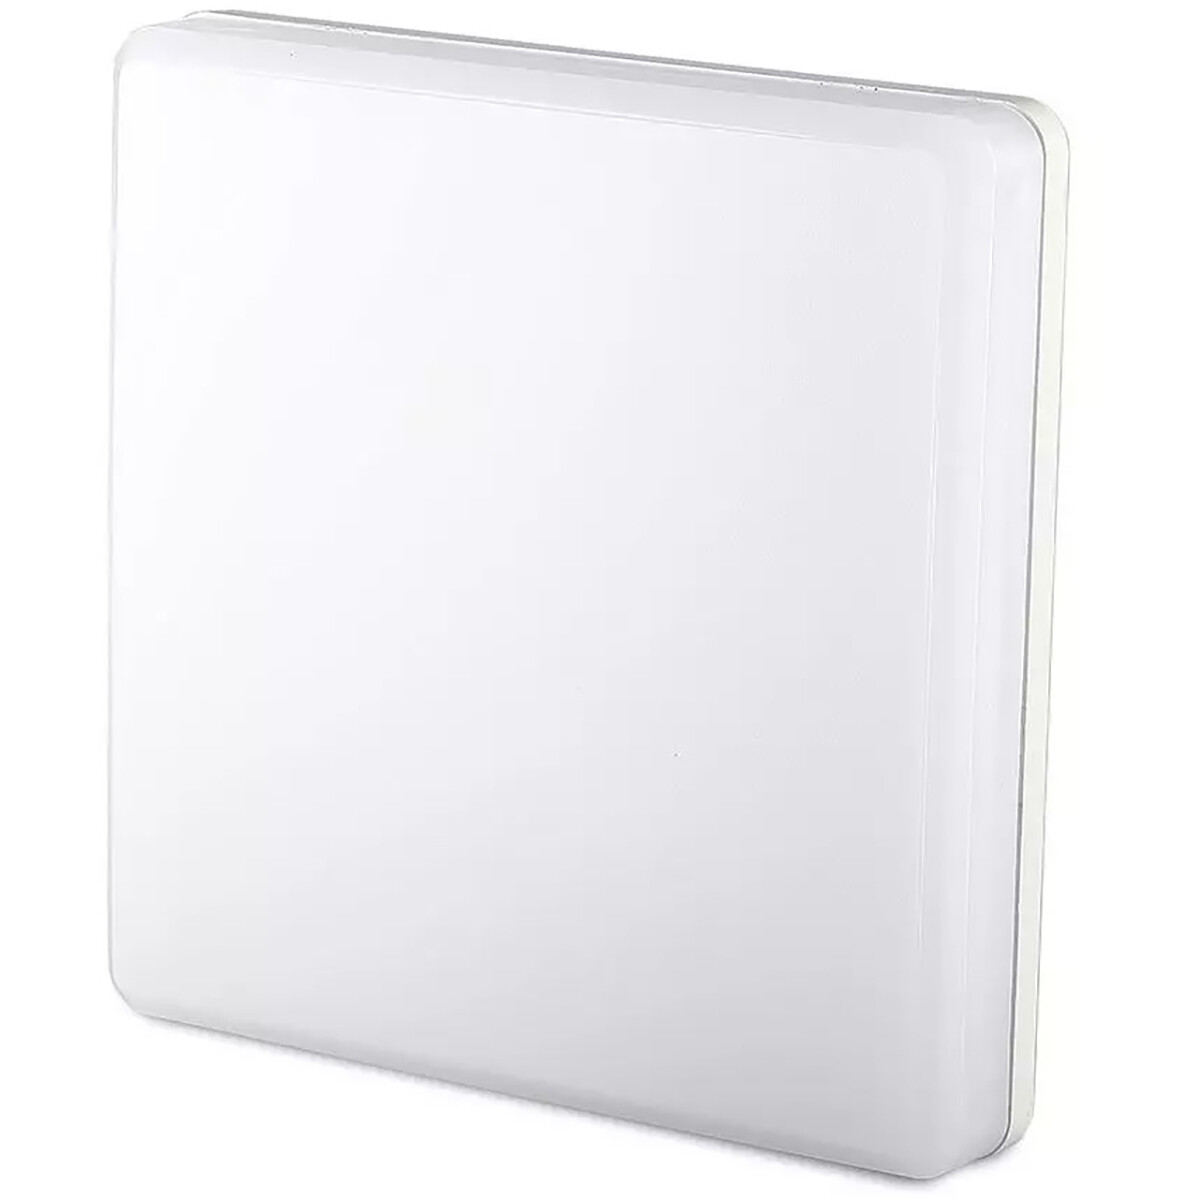 LED Plafondlamp - Viron Hasin - 15W - Inbouw Vierkant - Aanpasbare Kleur - Mat Wit - Kunststof